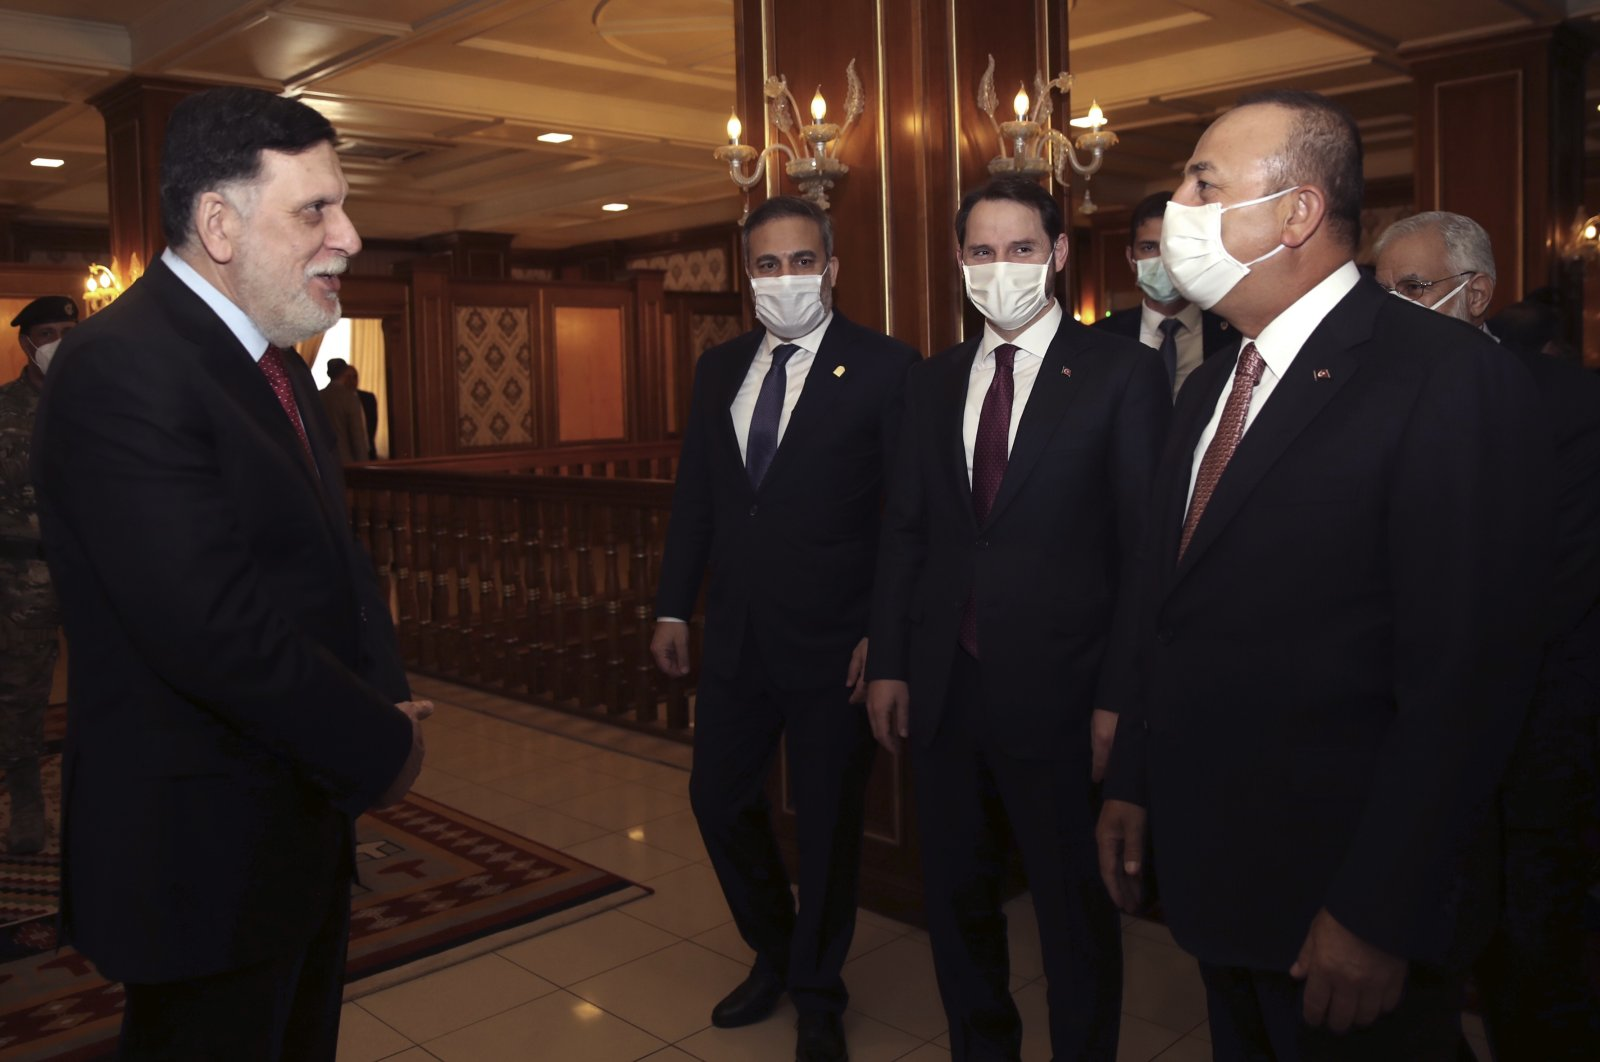 Turkish Foreign Minister Mevlüt Çavuşoğlu and Libyan Prime Minister Fayez Sarraj greet each other before their talks in Tripoli, Libya, June 17, 2020. (AP Photo)